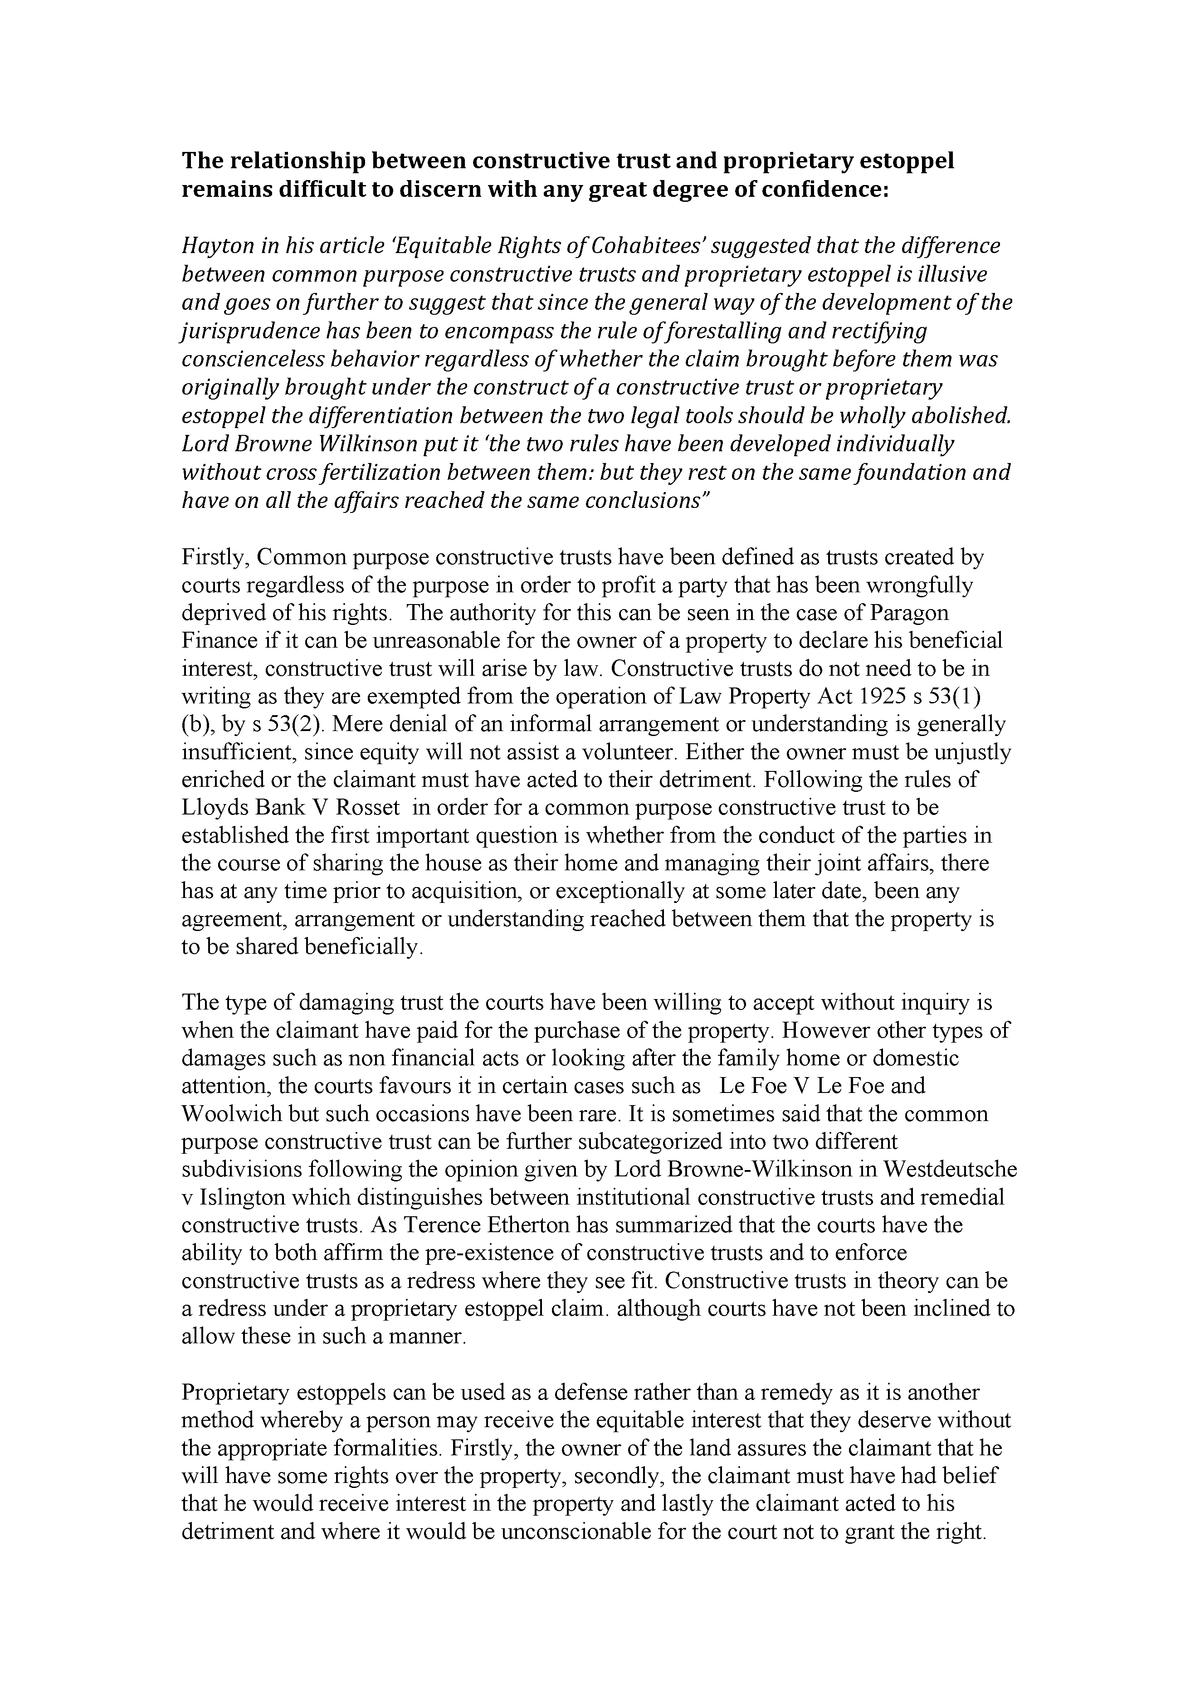 Properiatry estoppel and constructive trust essay - LA3003